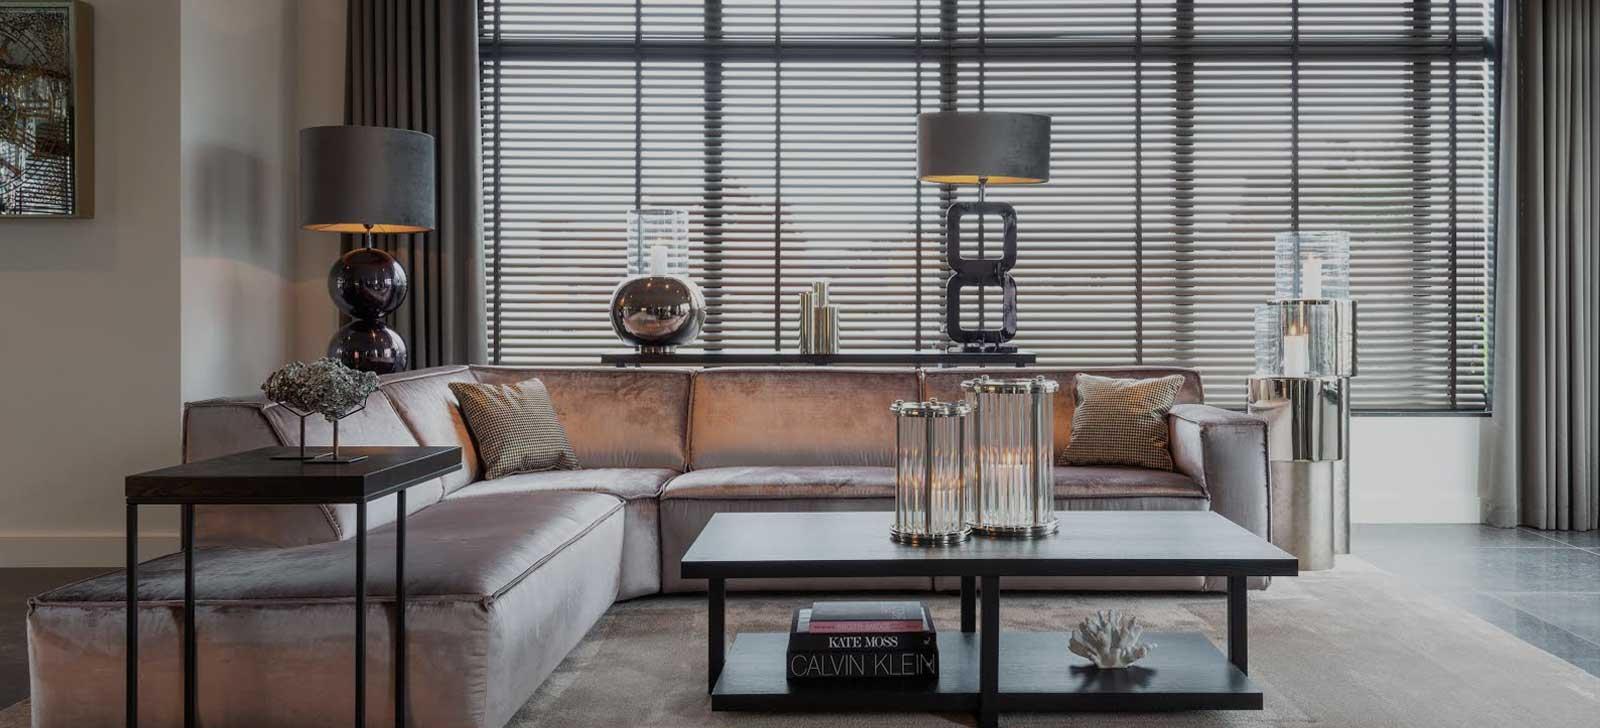 Mylestone Interiors Ltd